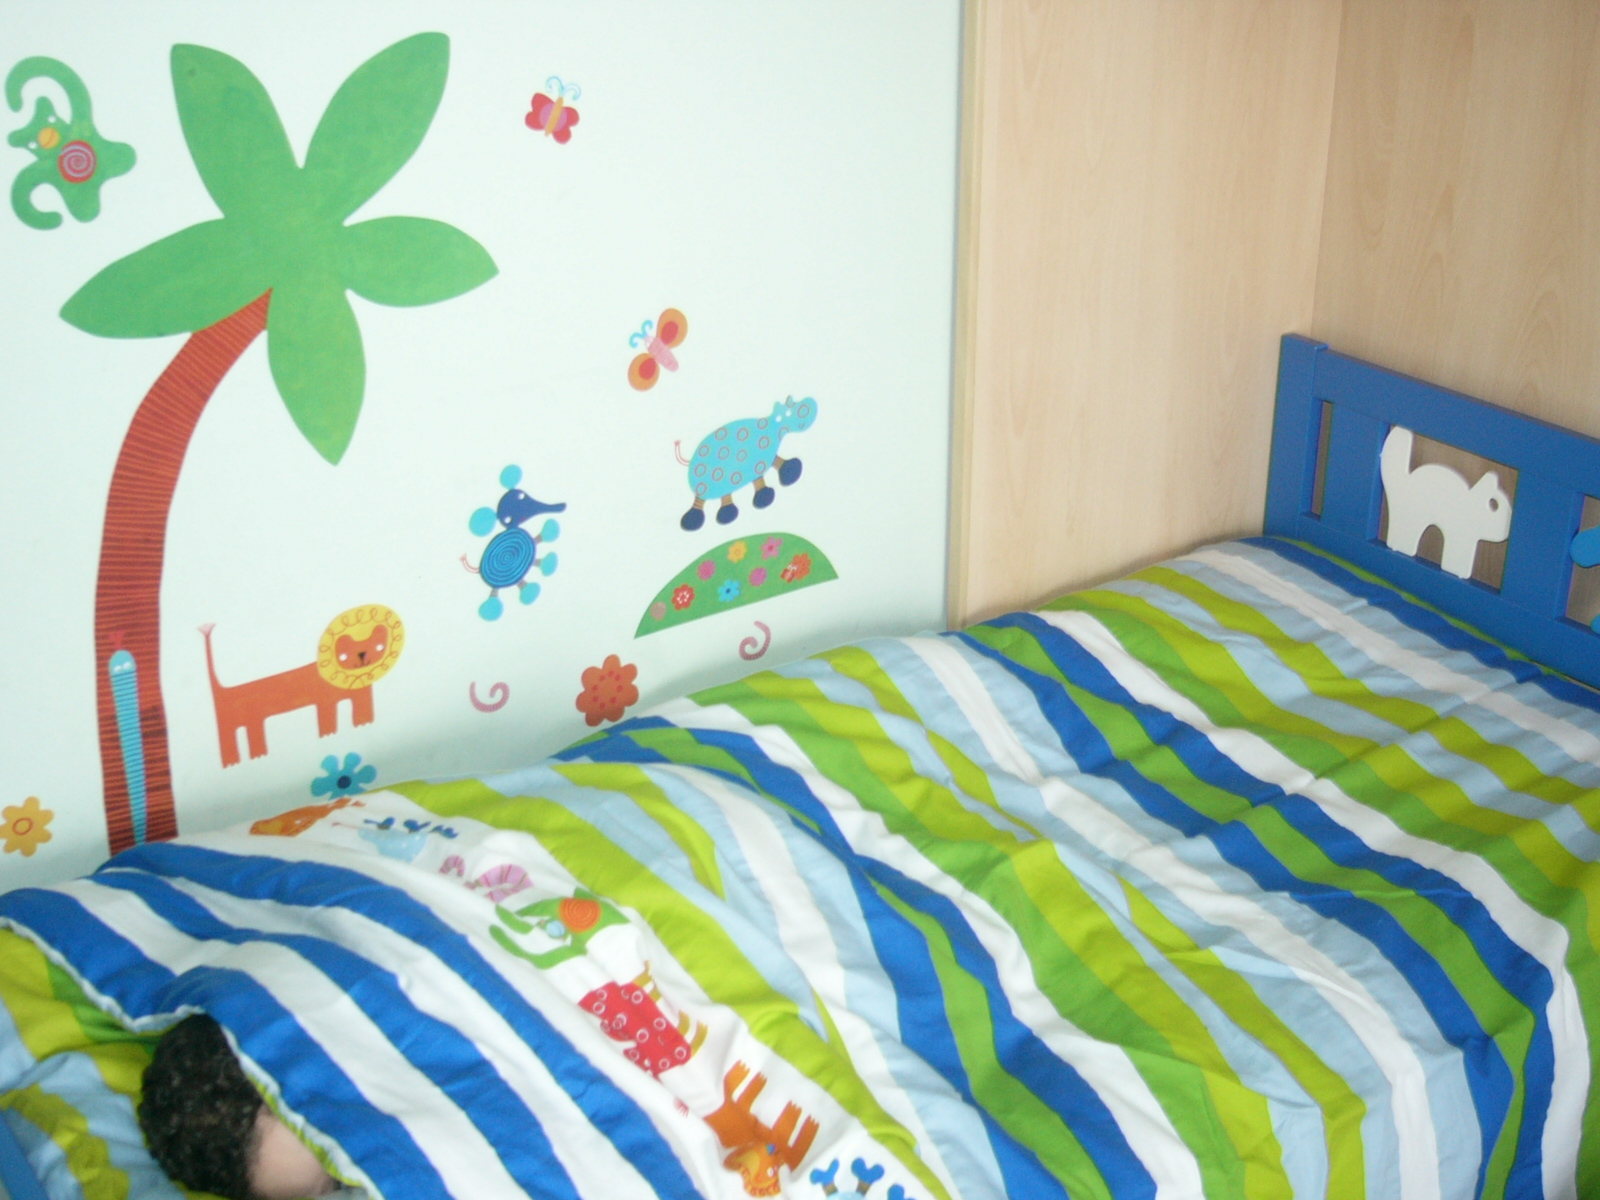 mammapig: poche cose di ikea - Copripiumino Bambina Ikea